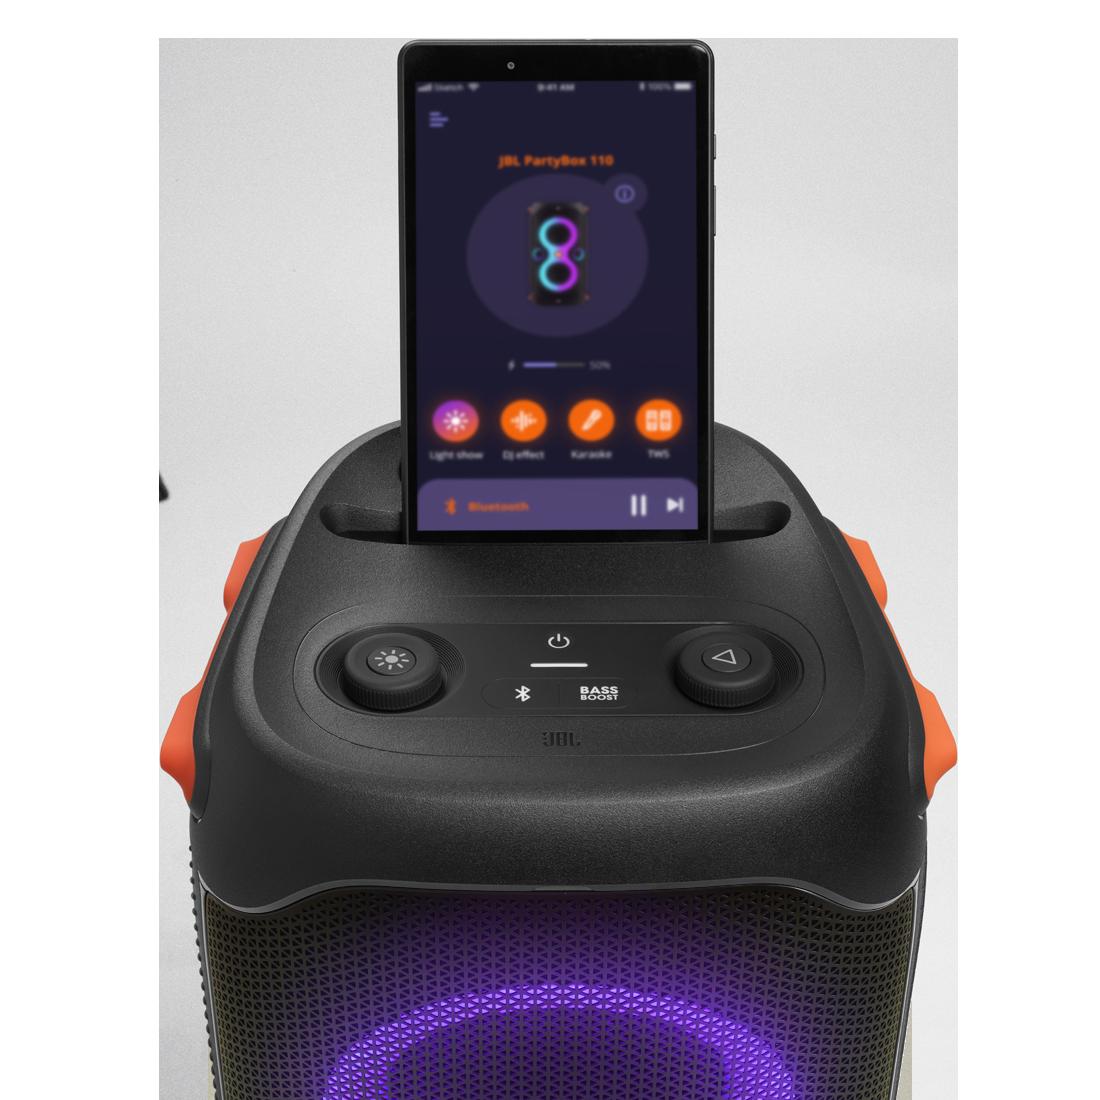 JBL Partybox 110 - Black - Portable party speaker with 160W powerful sound, built-in lights and splashproof design. - Detailshot 5